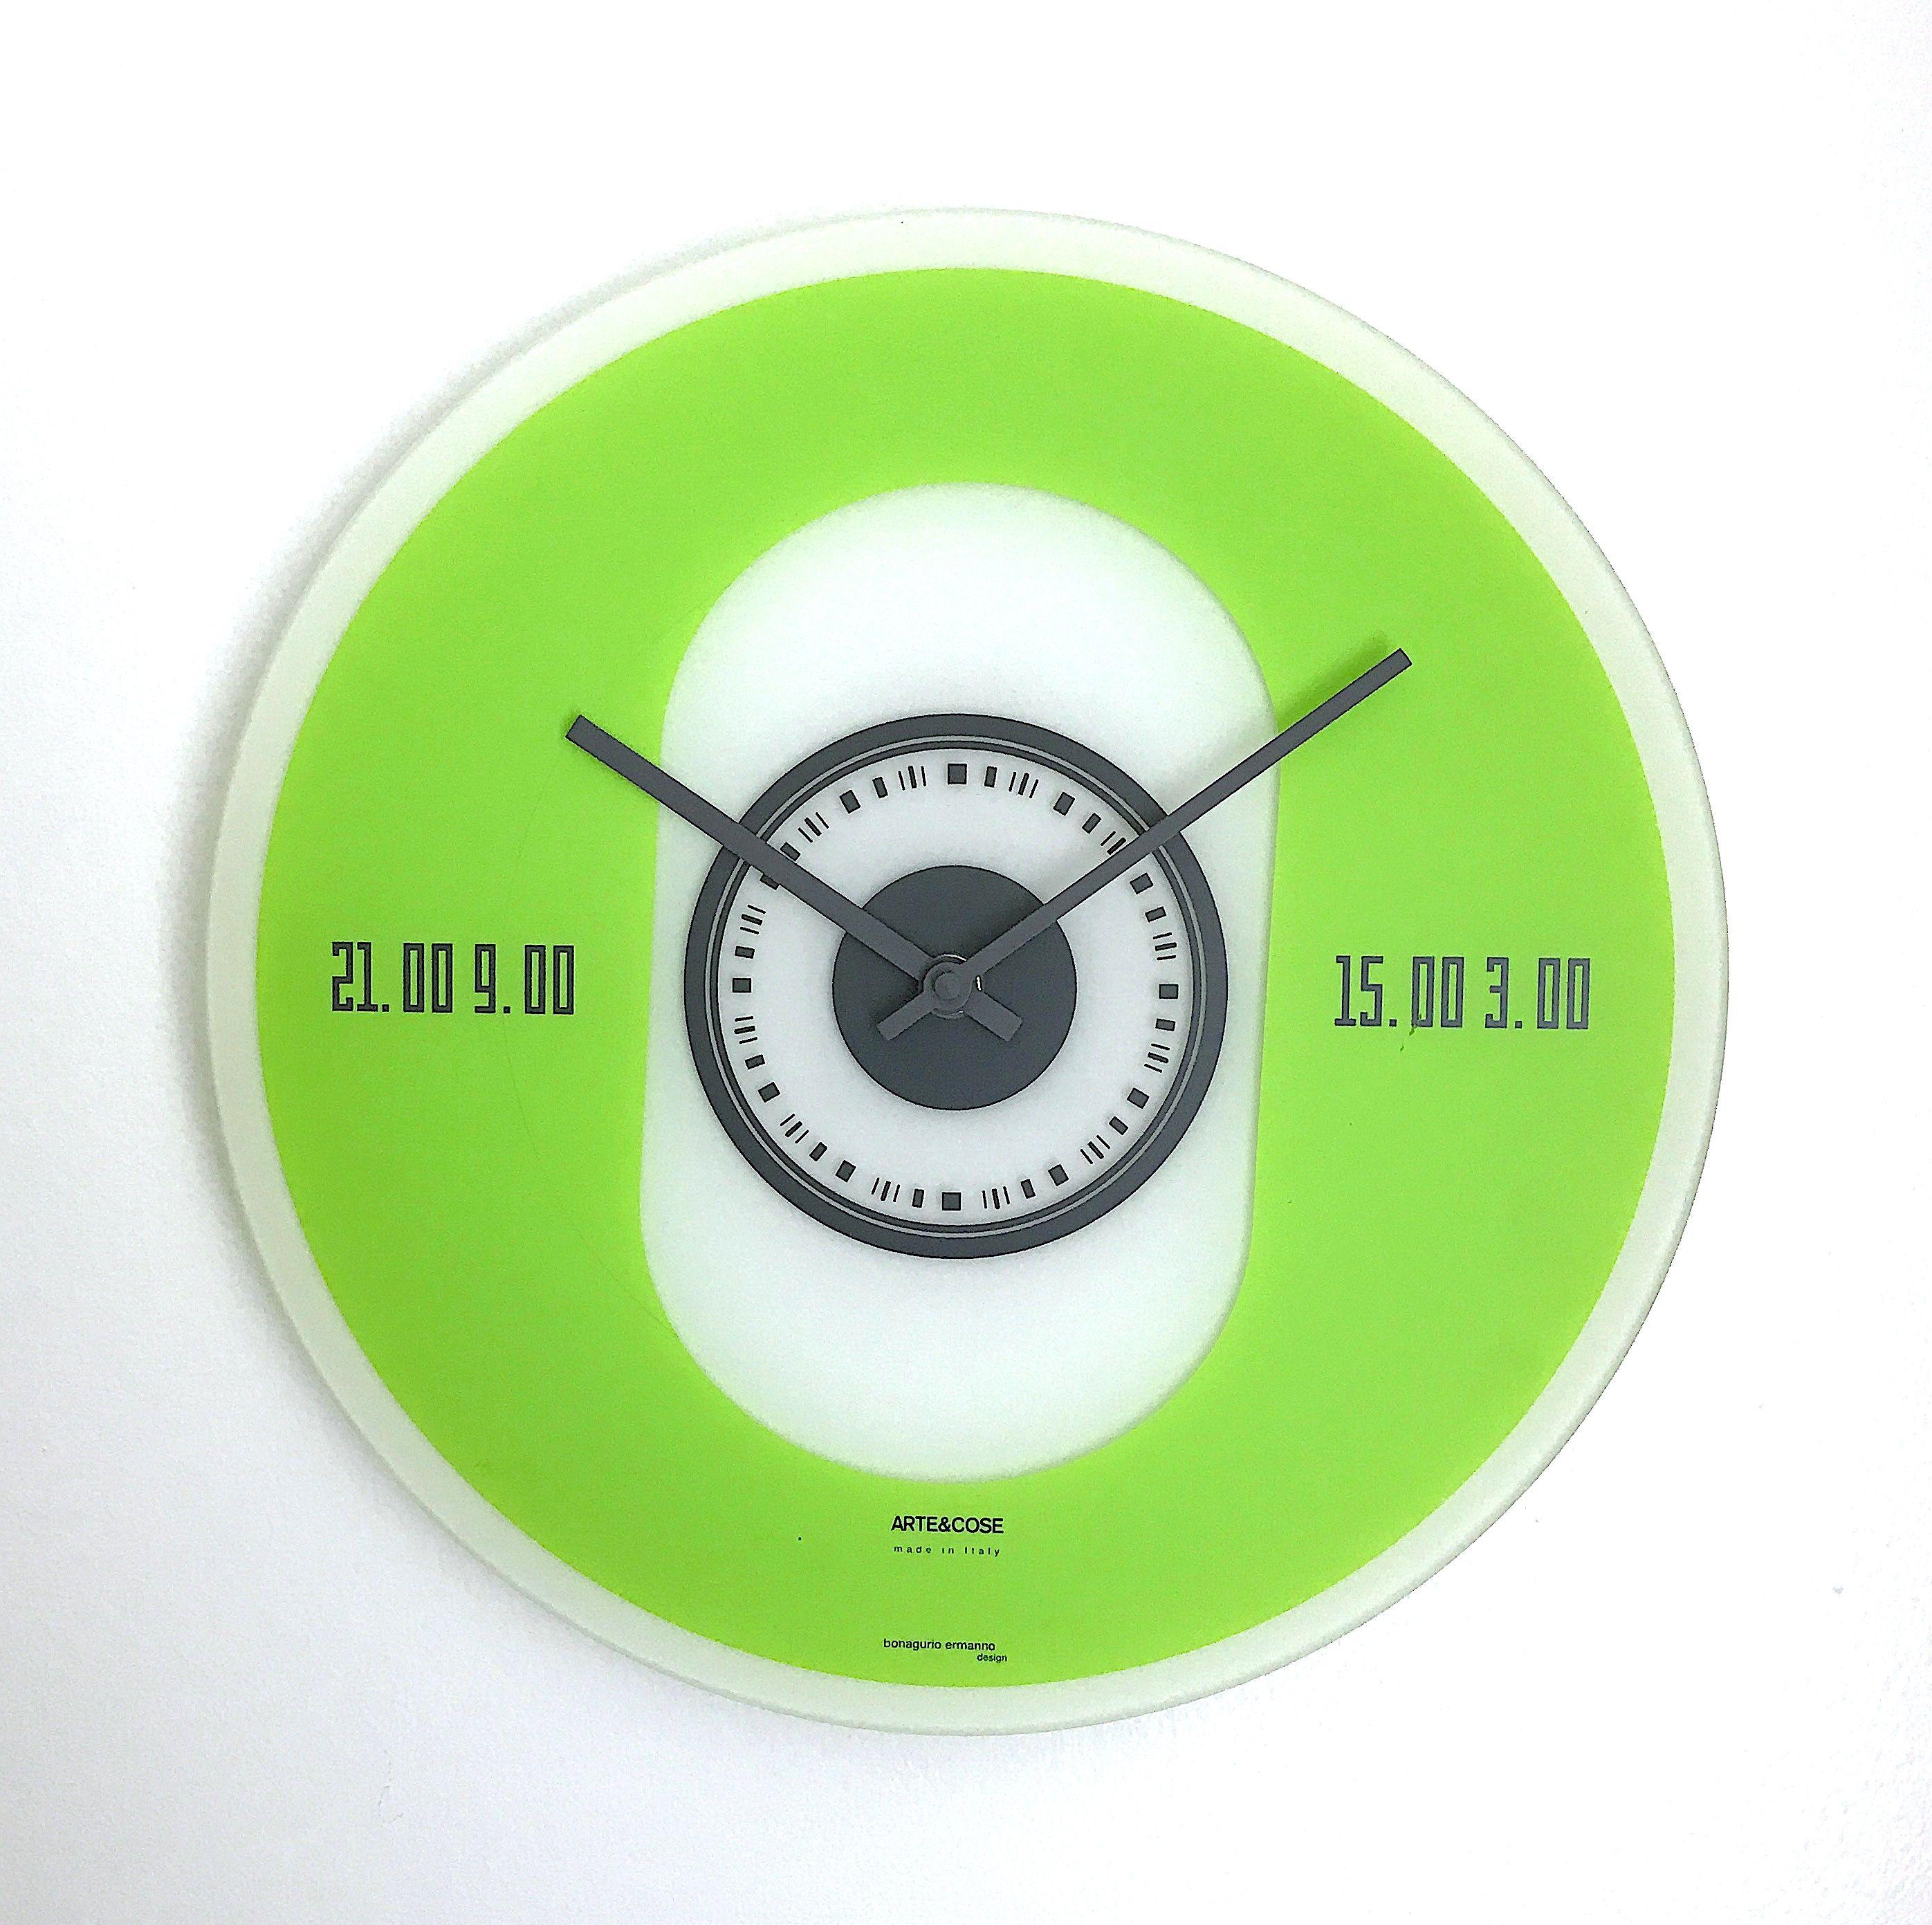 Artecose wall clock by bonagurio ermanno design aa pinterest artecose wall clock by bonagurio ermanno design amipublicfo Image collections